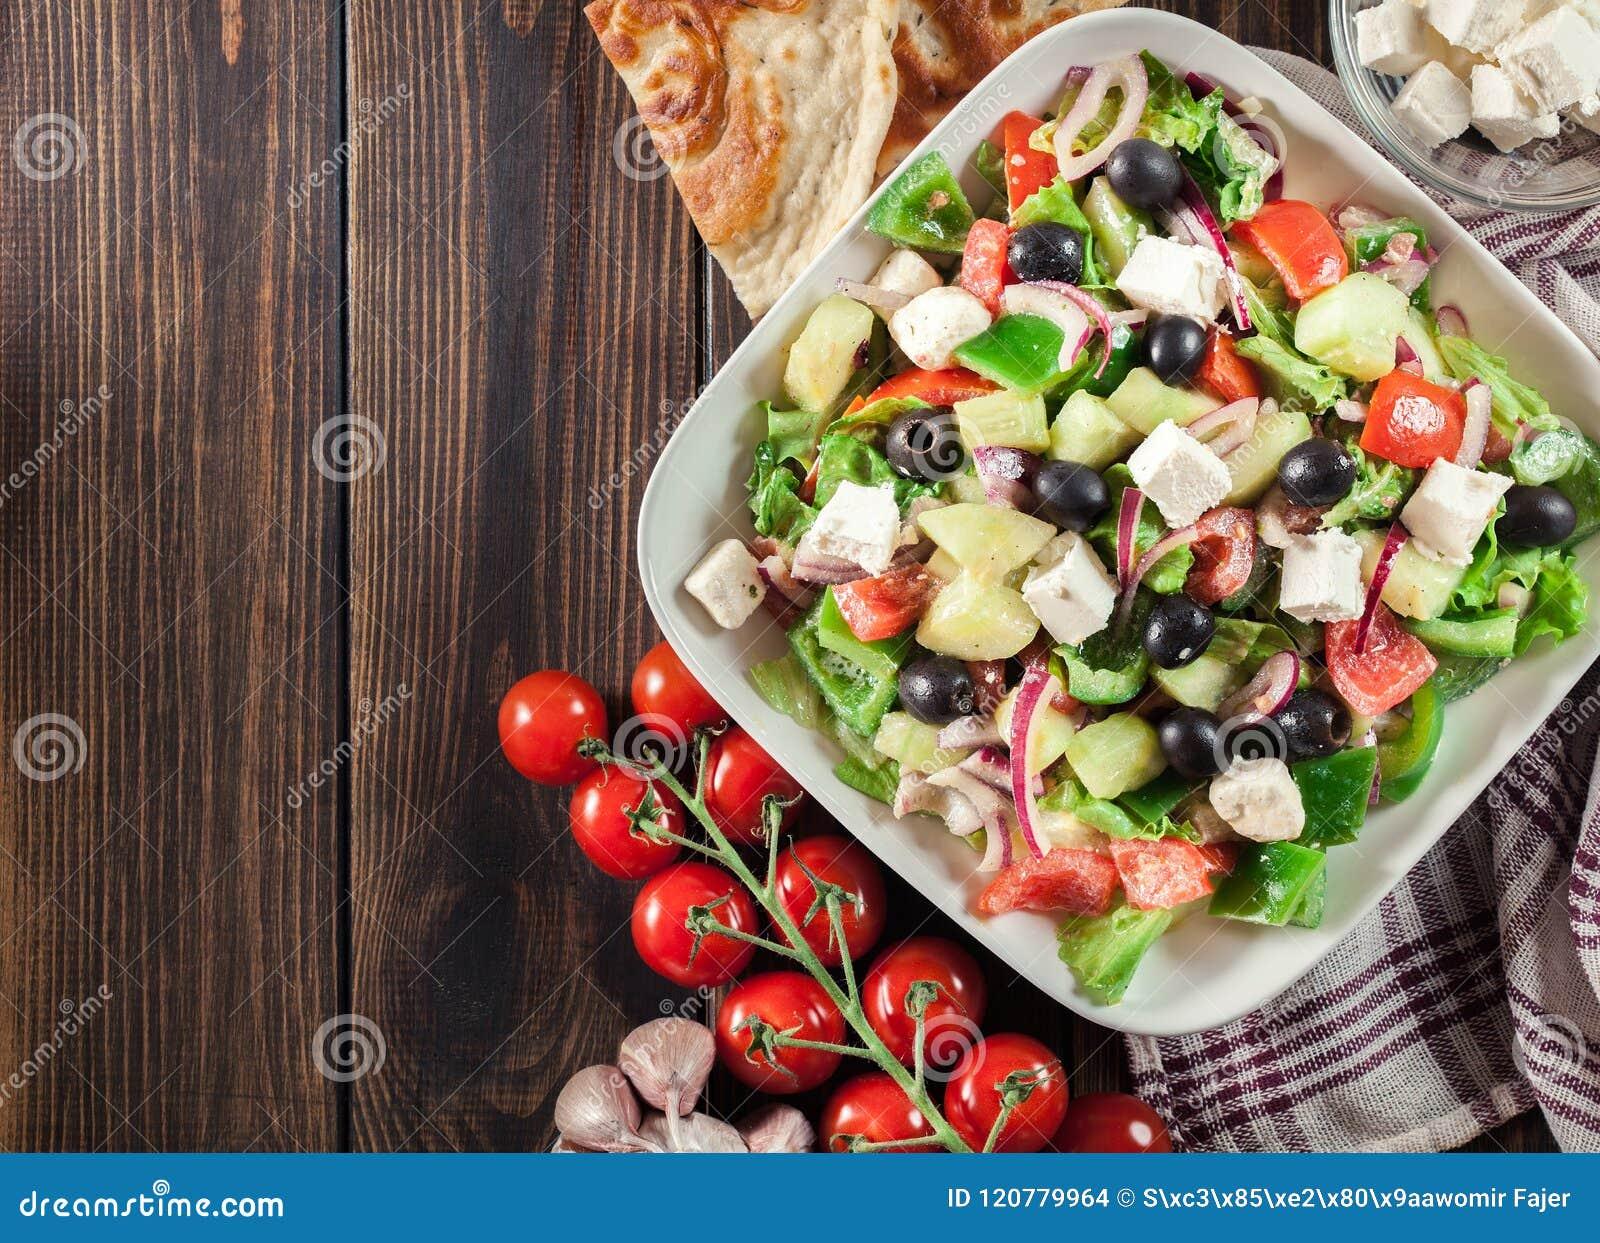 Salada grega com legumes frescos